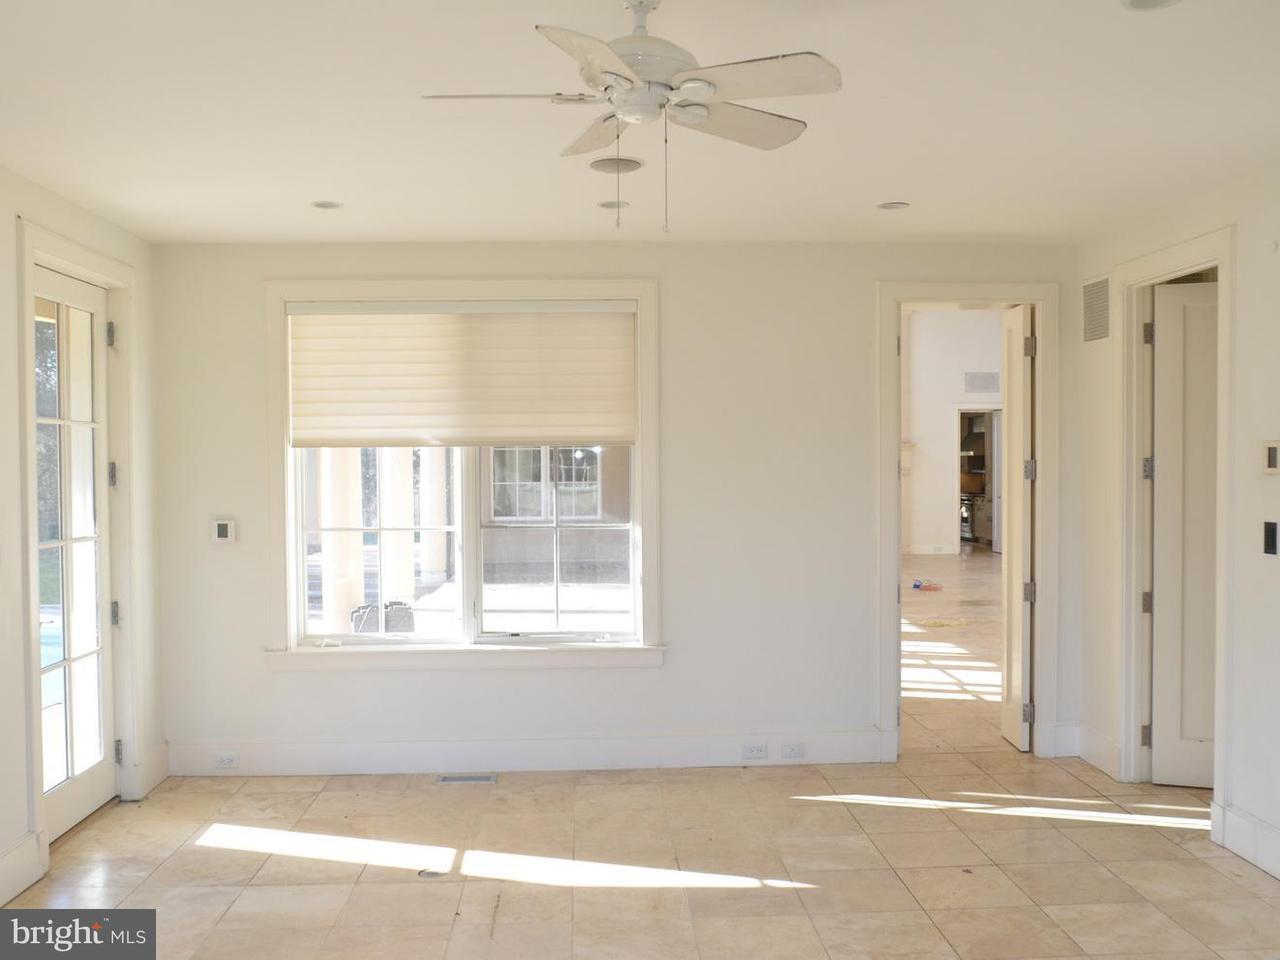 Additional photo for property listing at 12414 Glen Road 12414 Glen Road Rockville, Maryland 20854 United States